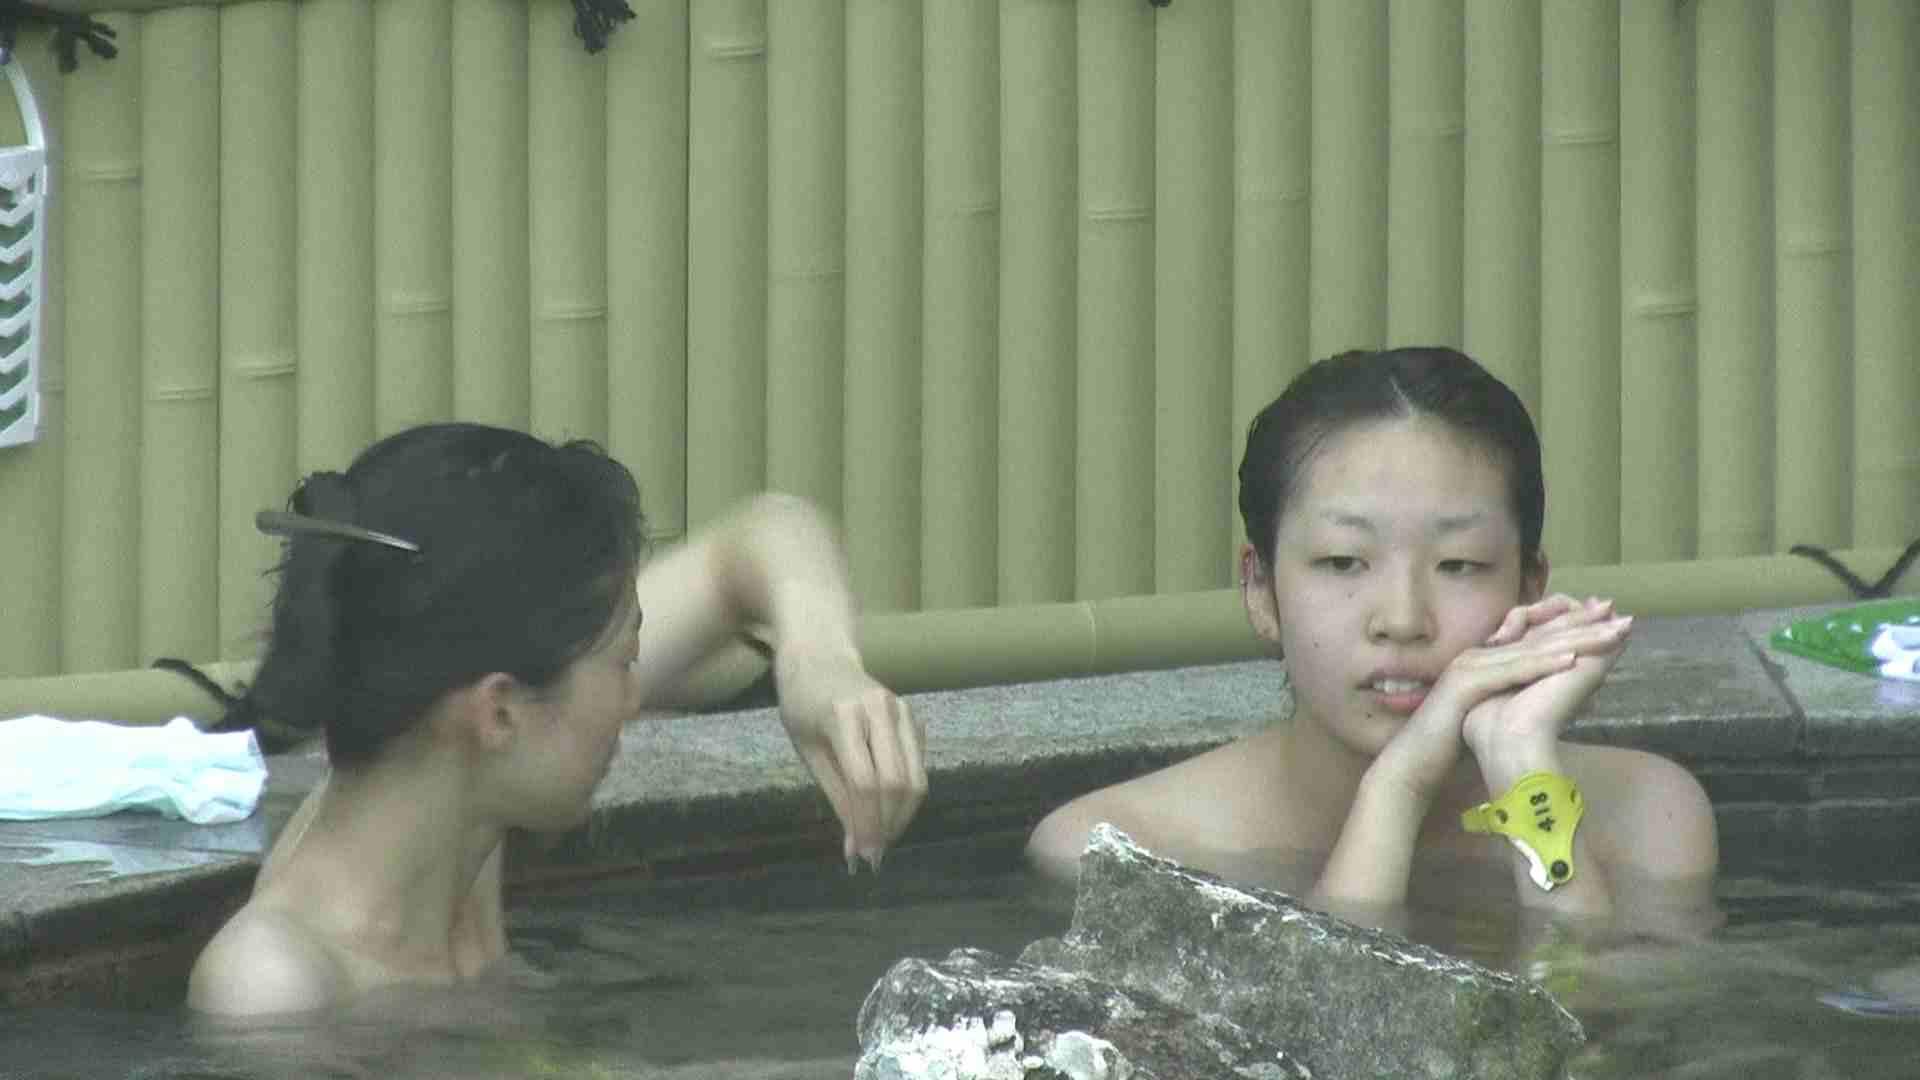 Aquaな露天風呂Vol.195 OLセックス 盗撮ワレメ無修正動画無料 71画像 29